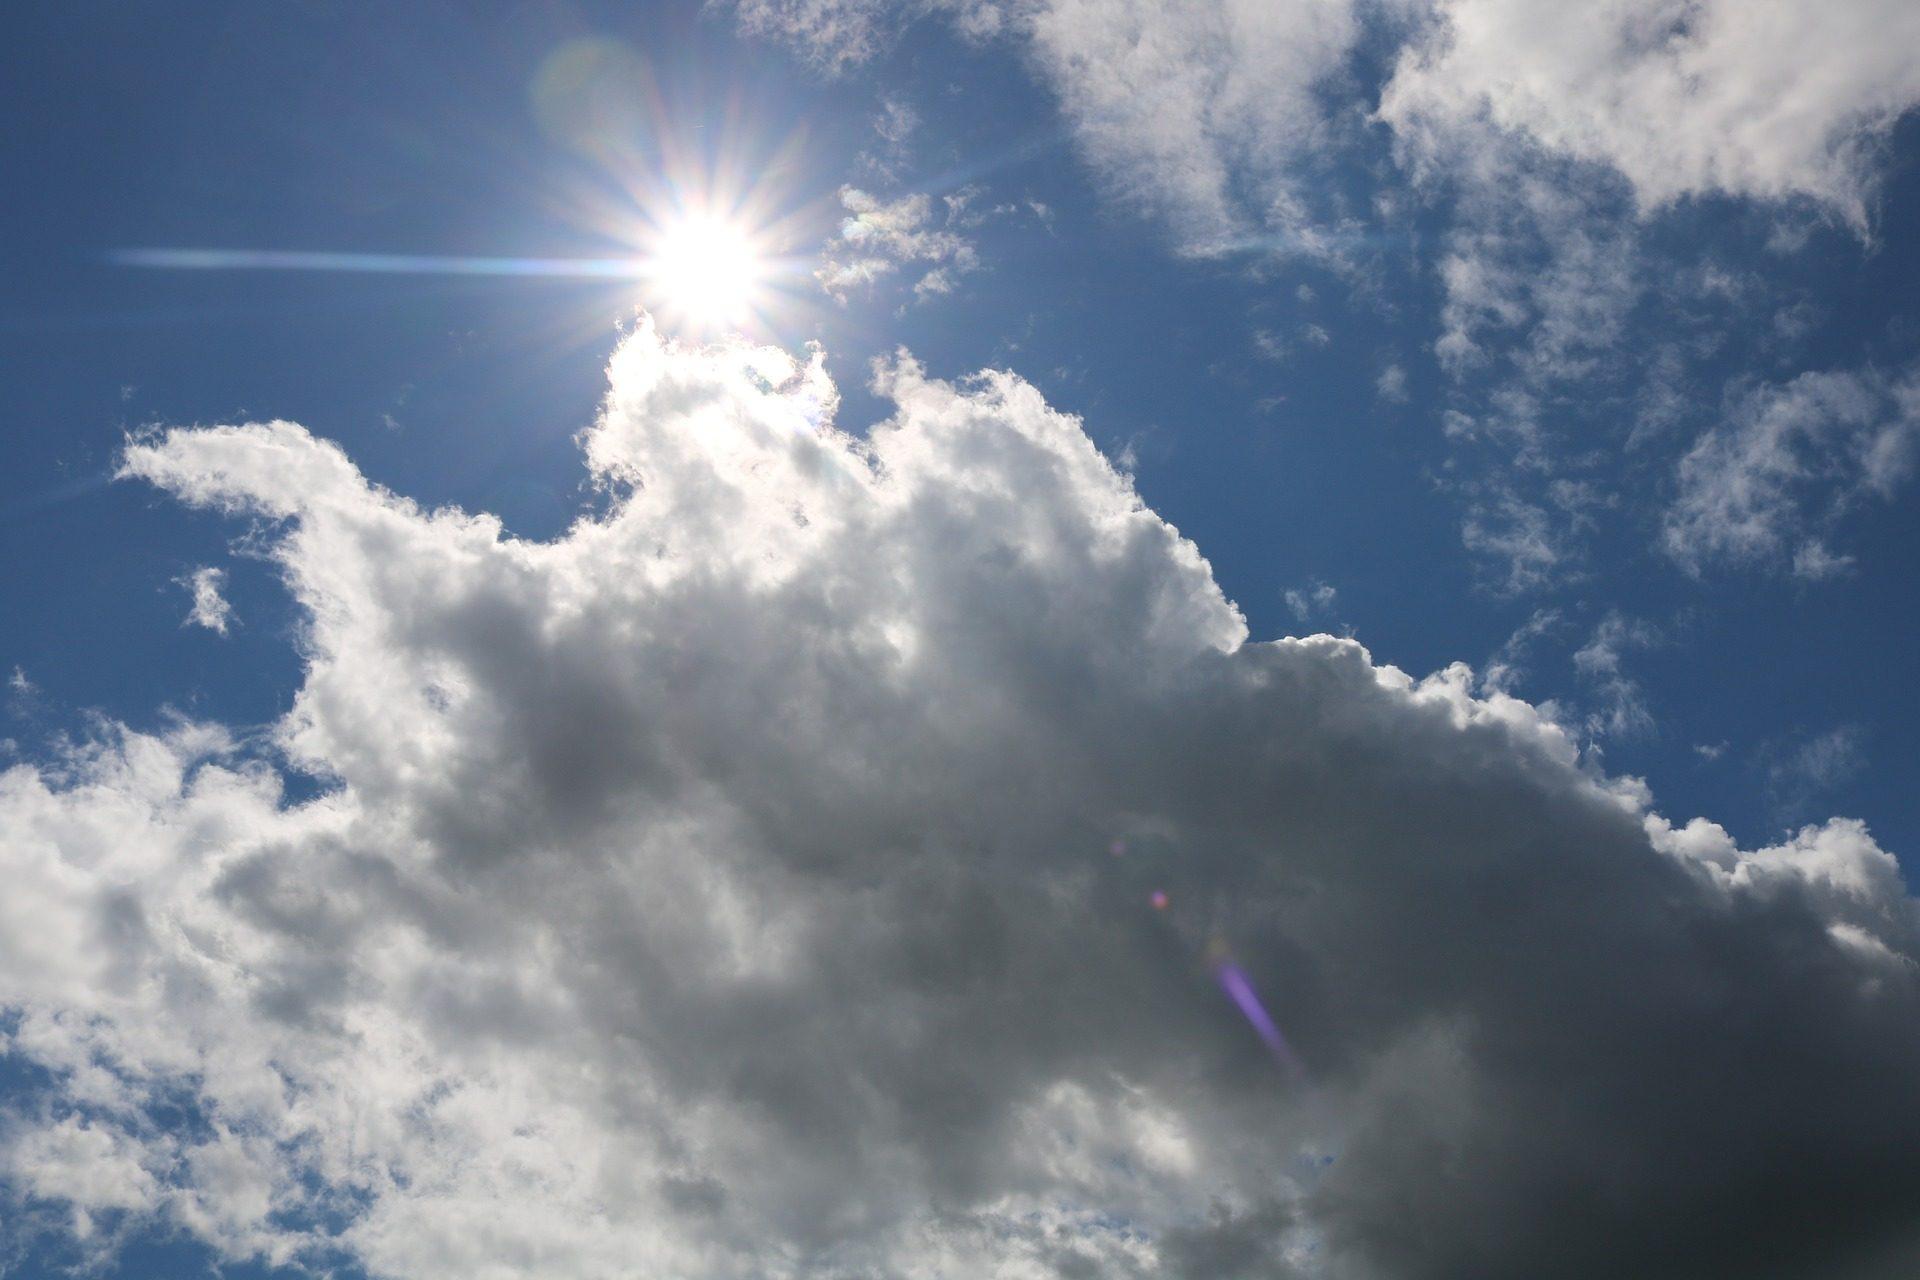 Солнце, лучи, гало, облака, Небо, жара - Обои HD - Профессор falken.com